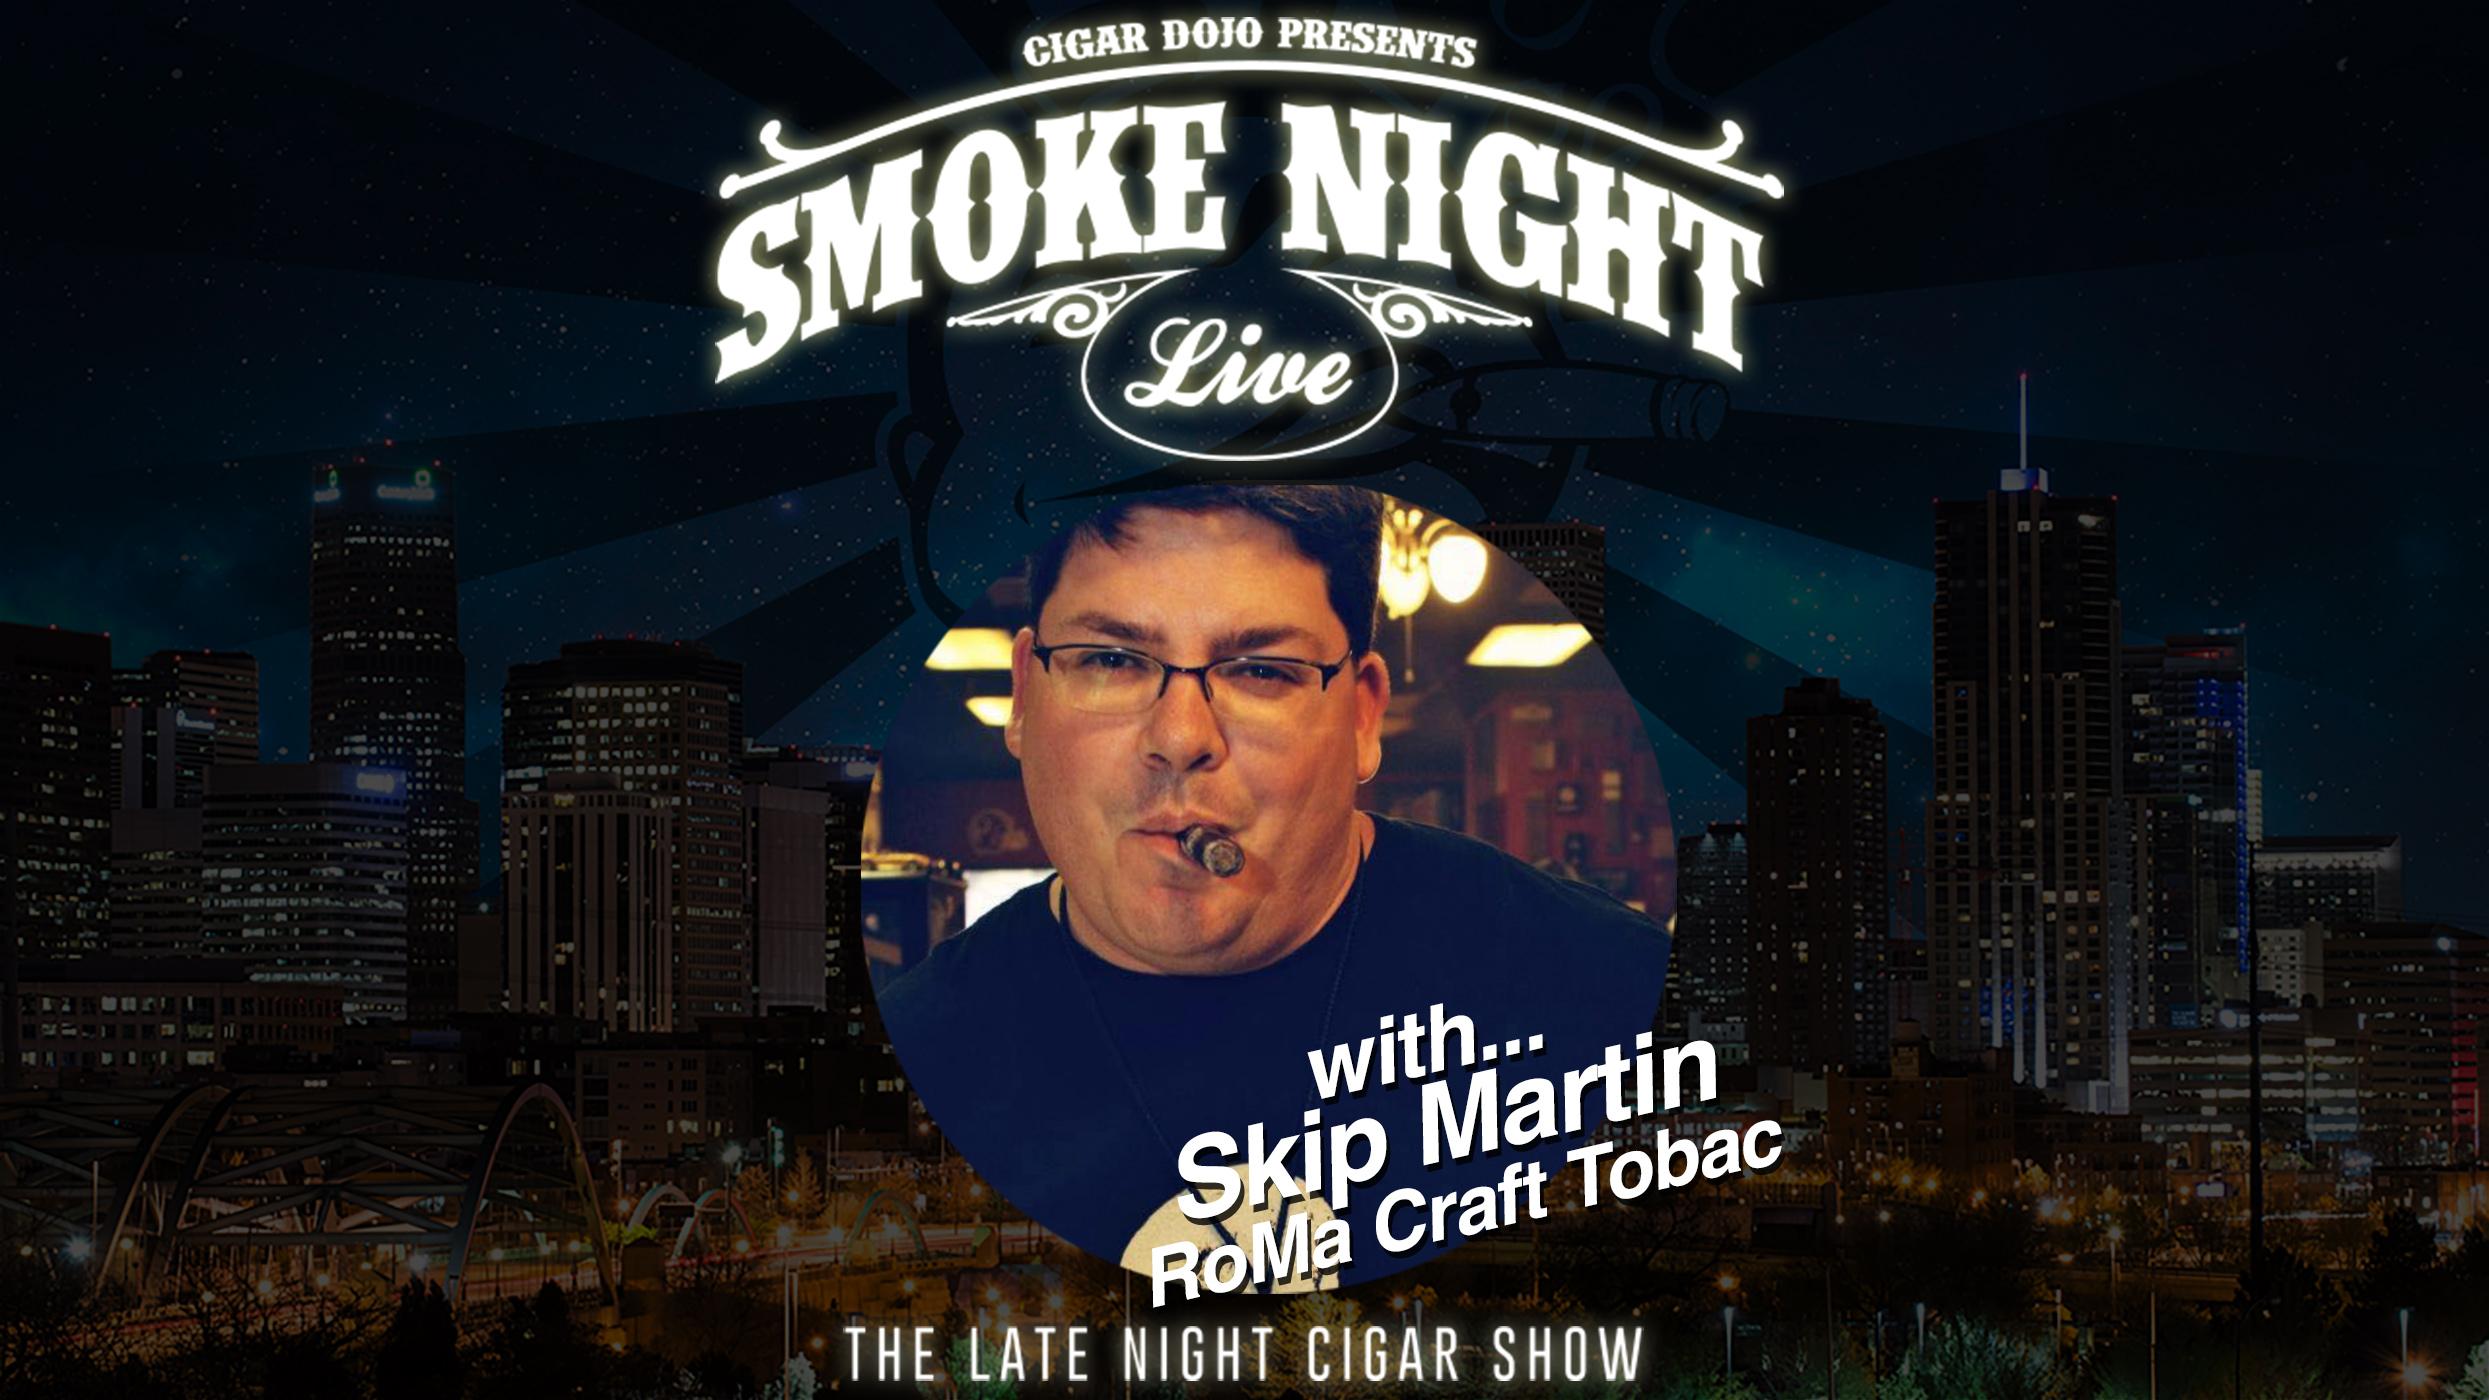 Skip Martin RoMa Craft Tobac